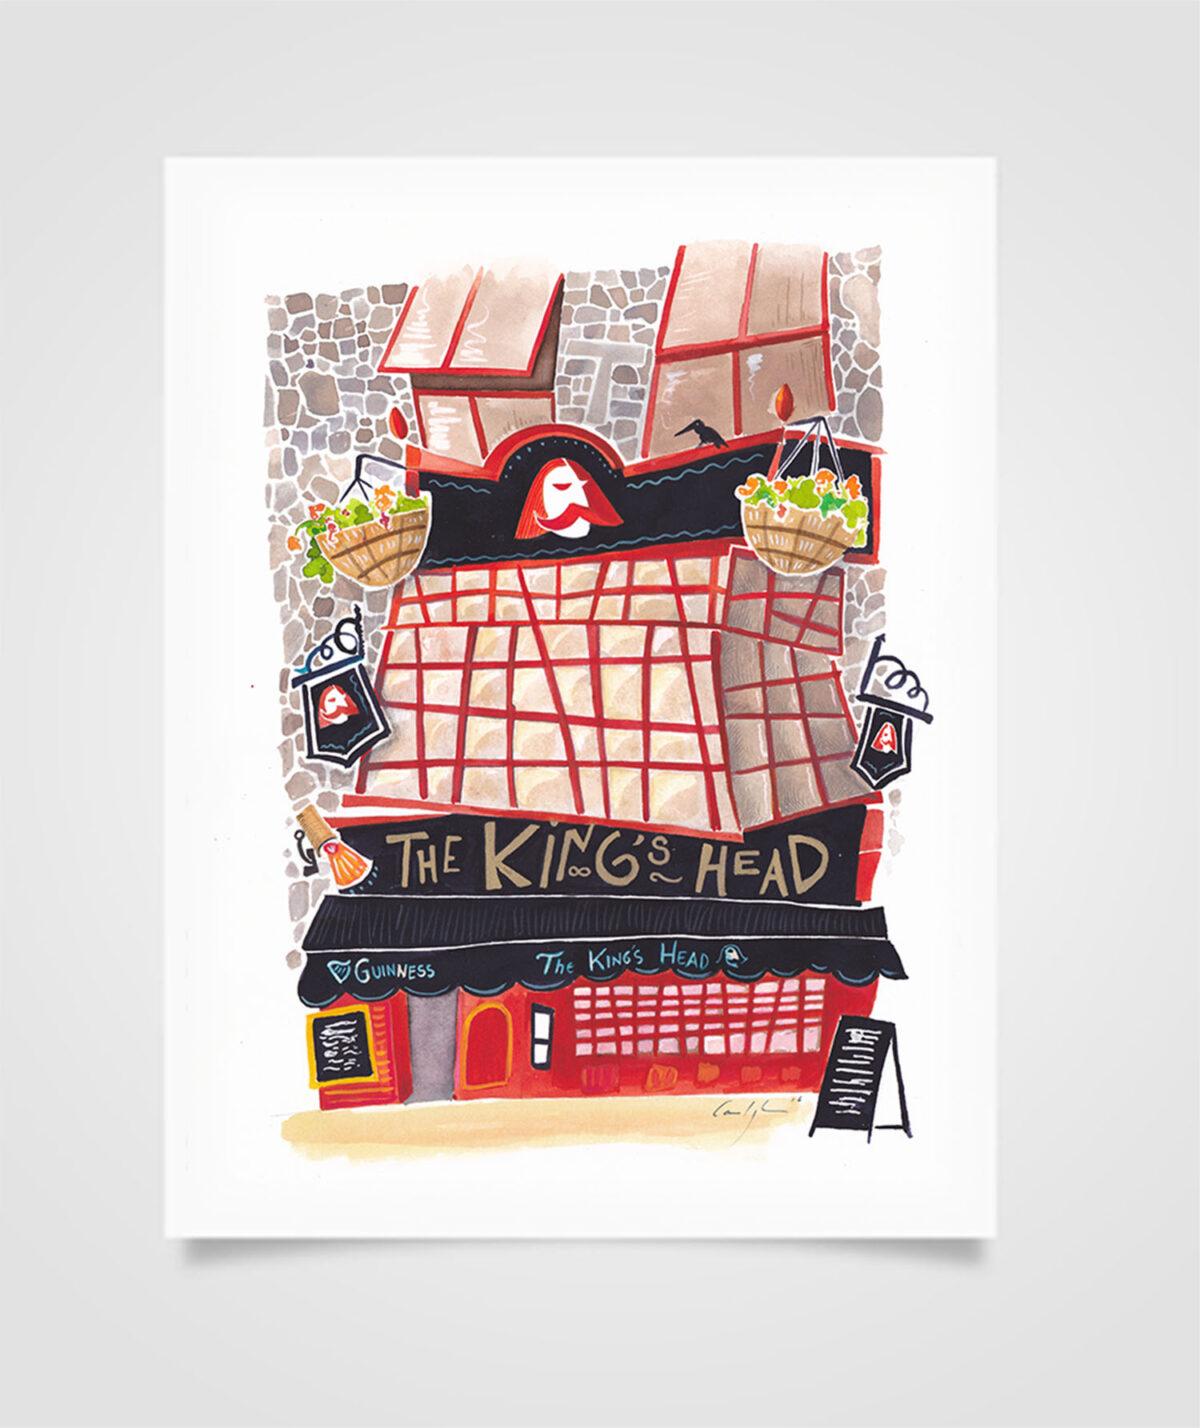 """Eire - The King's Head"" Tecniche miste su carta, 21 x 29,7 cm (2016)"